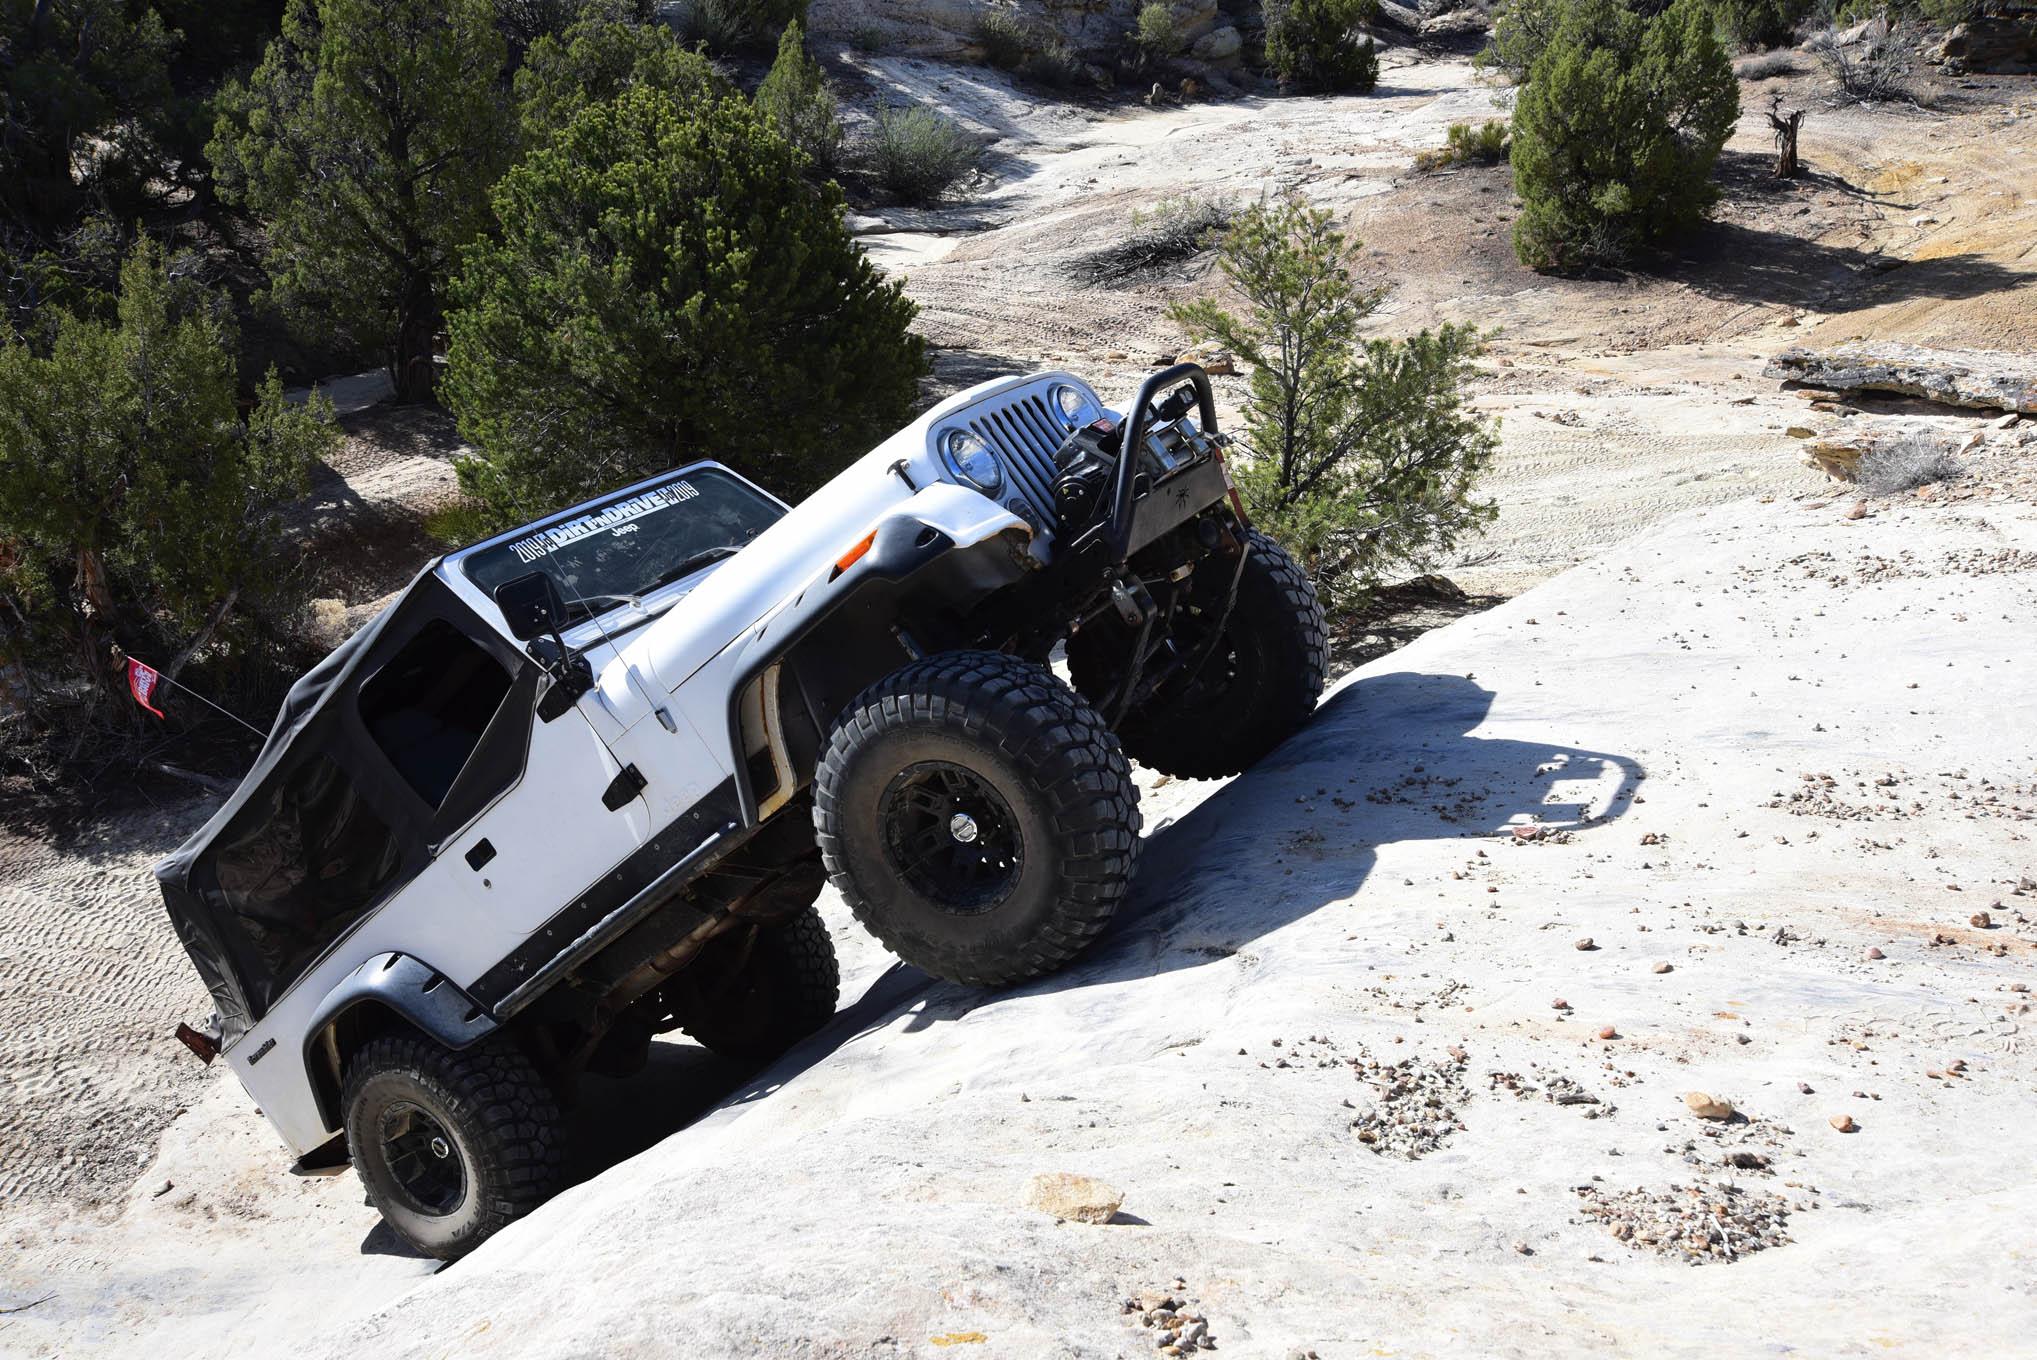 021 jeep 1984 scrambler cj8 cj 8 jp magazine stuart bourdon aaron paris